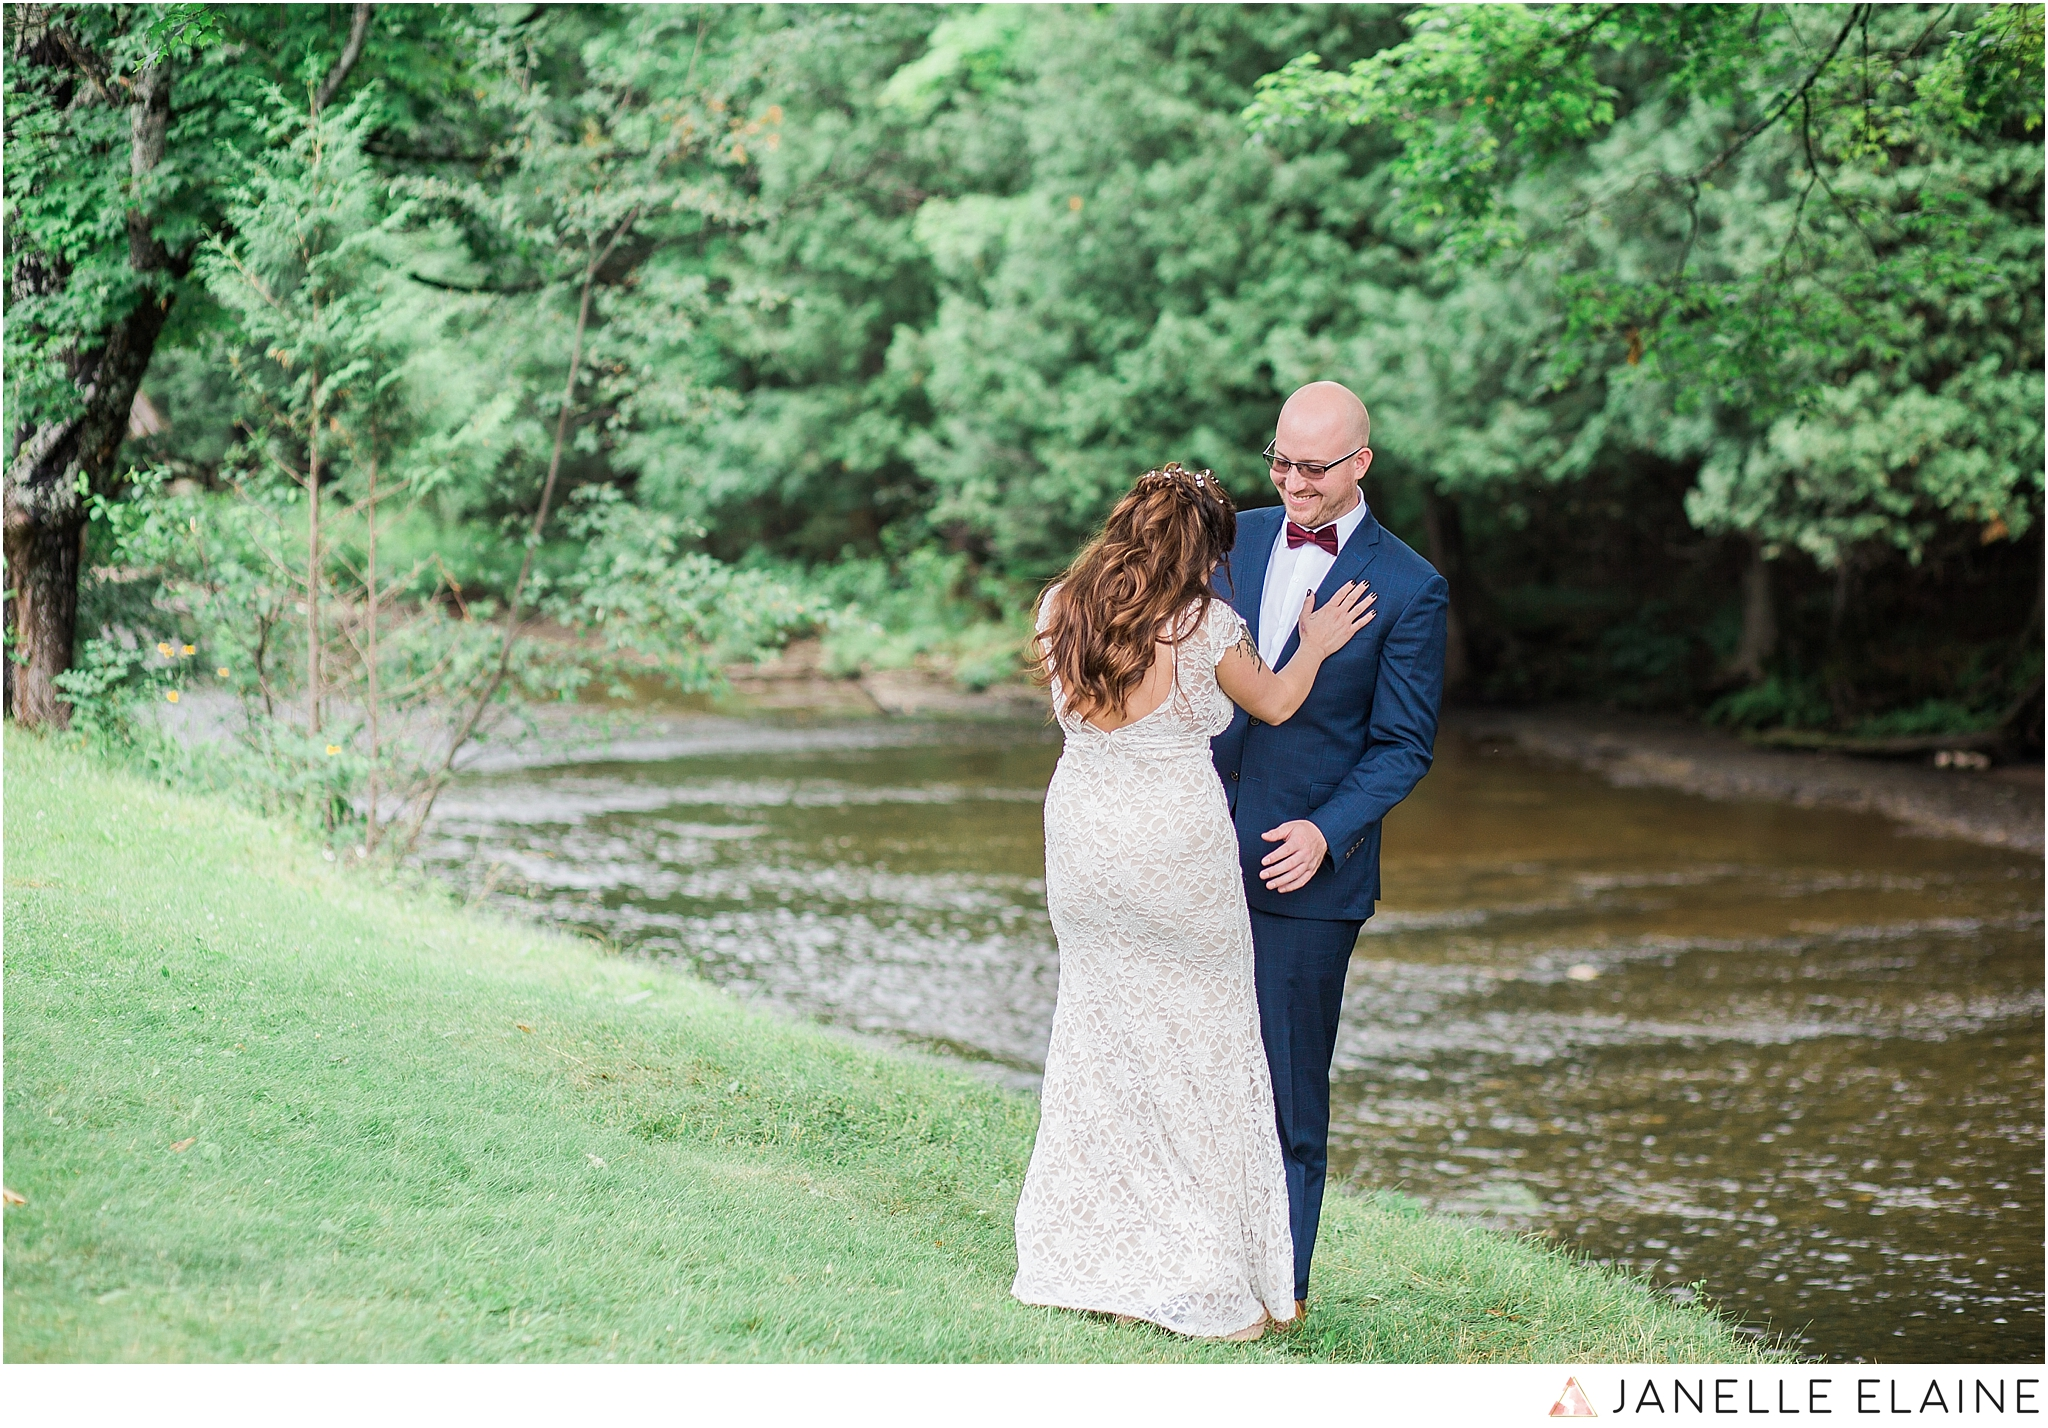 janelle elaine photography-seattle-destination-wedding-photographer-15.jpg